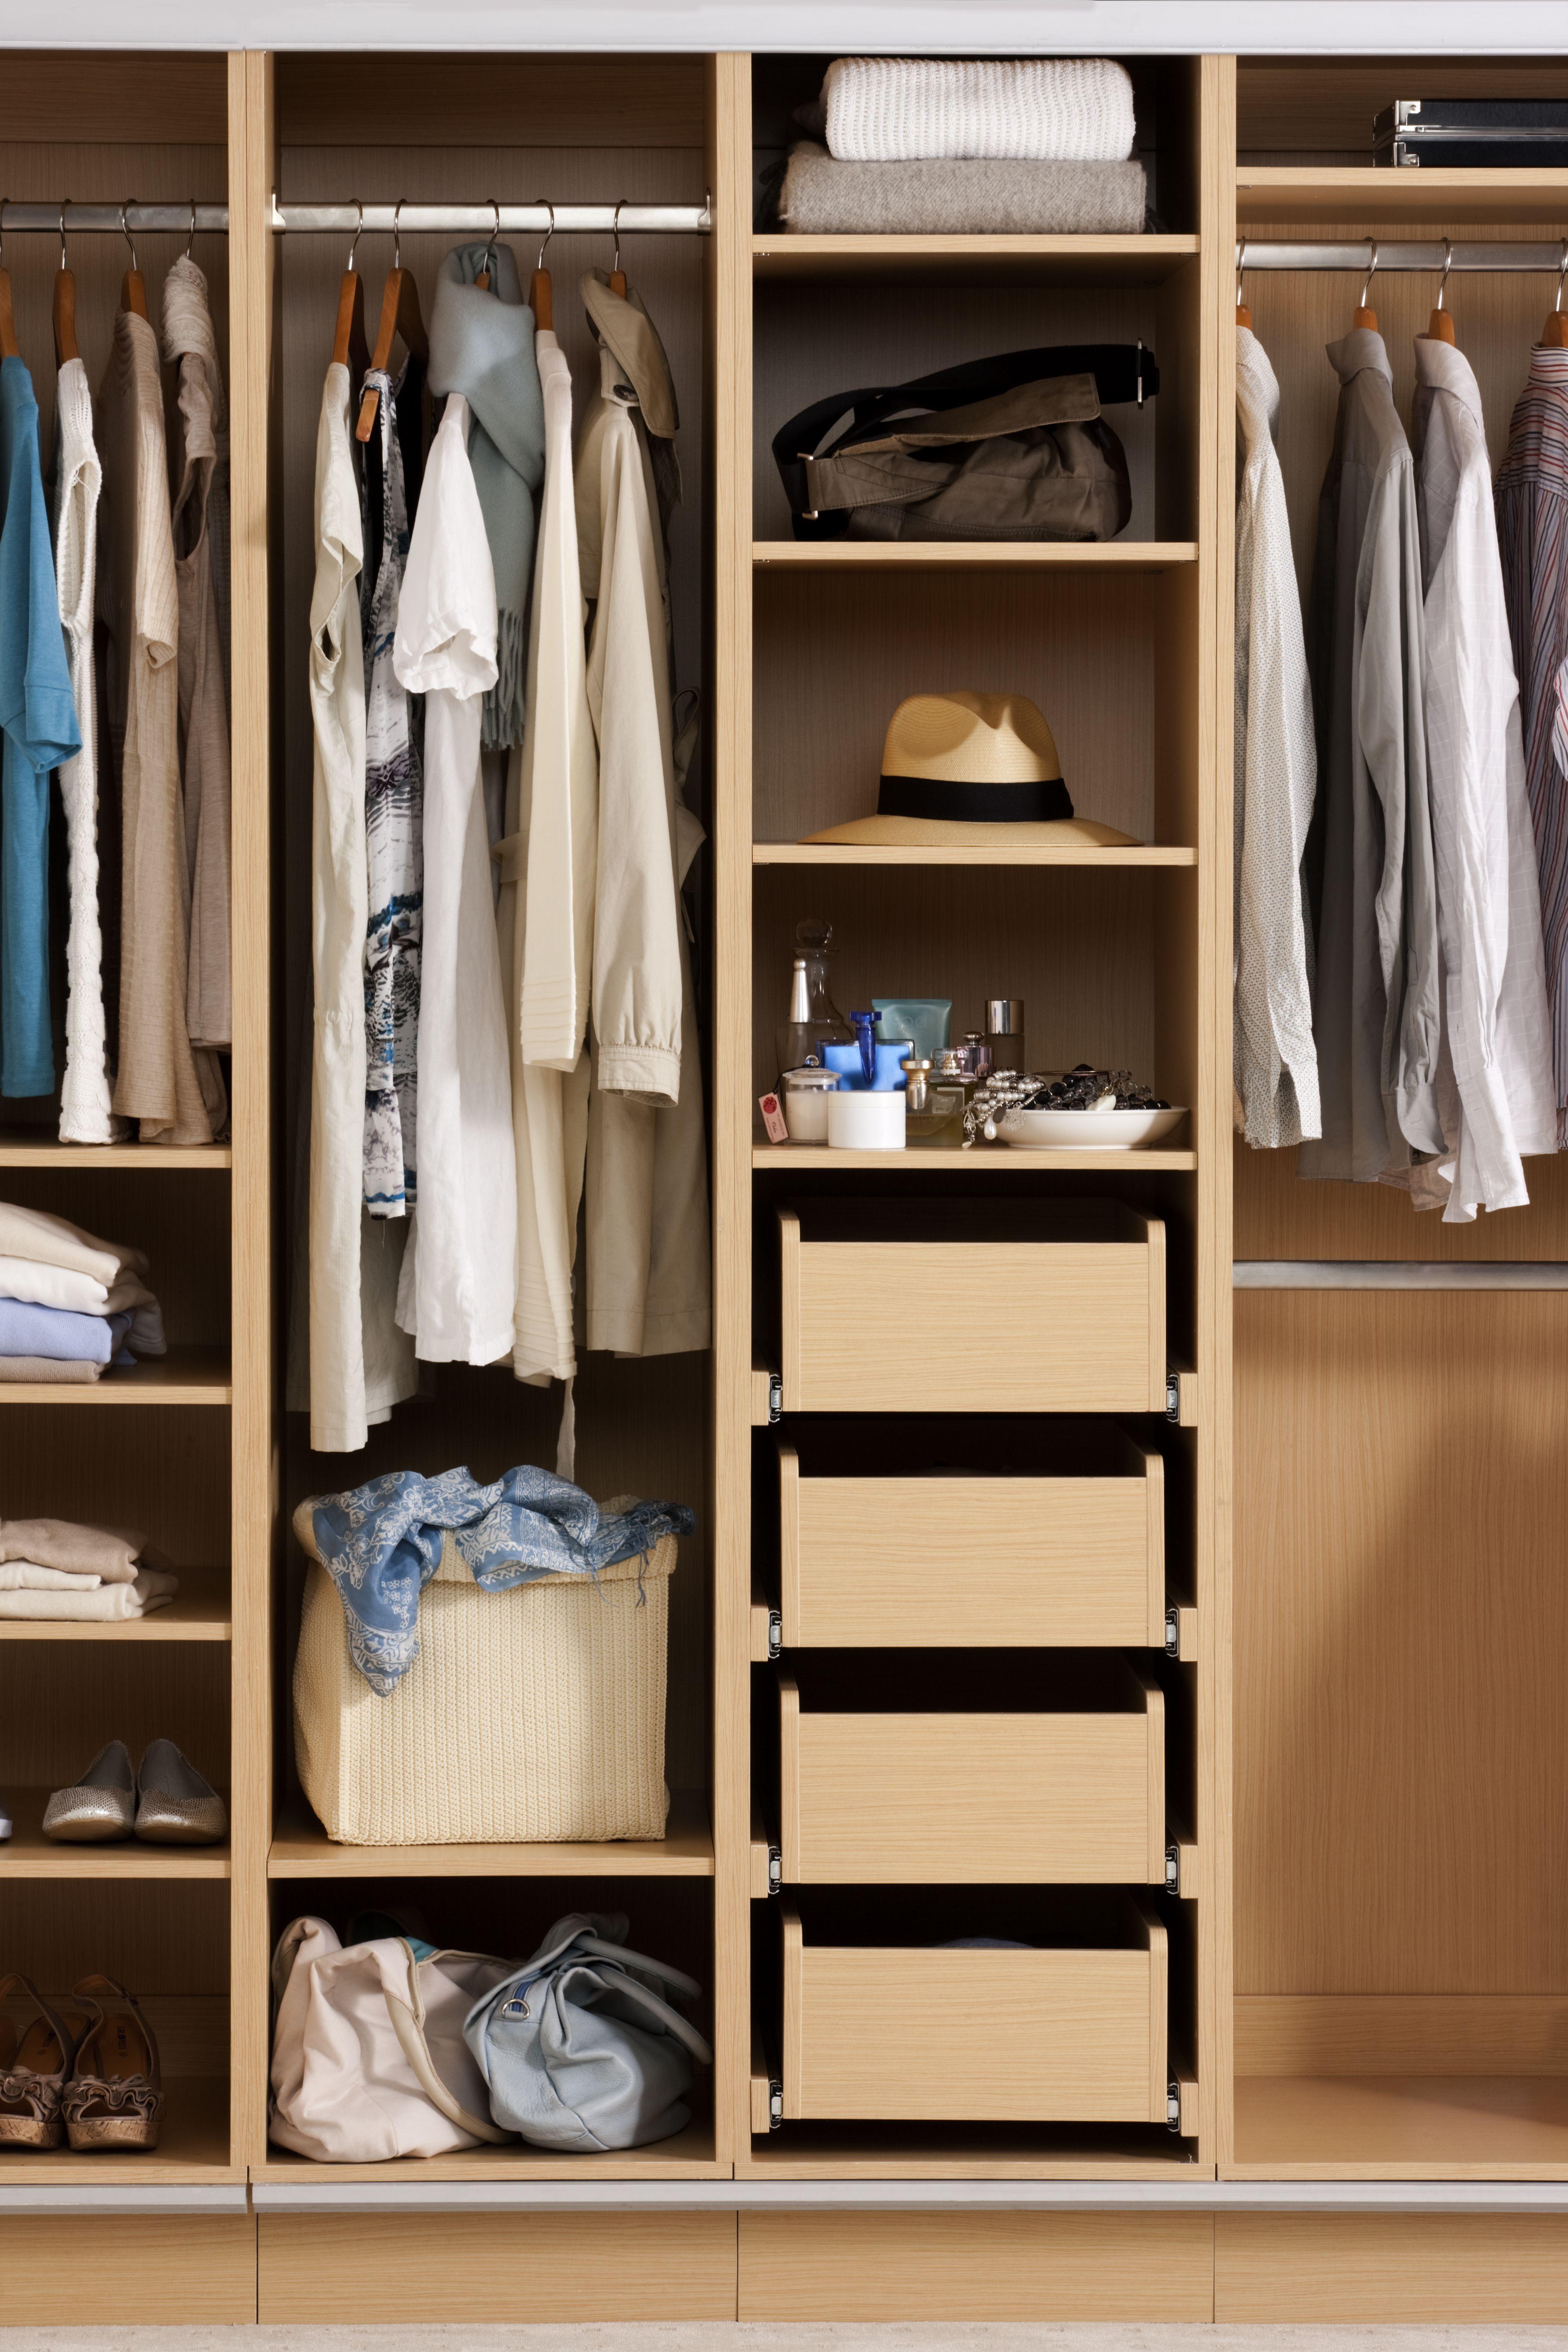 Bunnings Wardrobe Planner - Wardrobe For Home